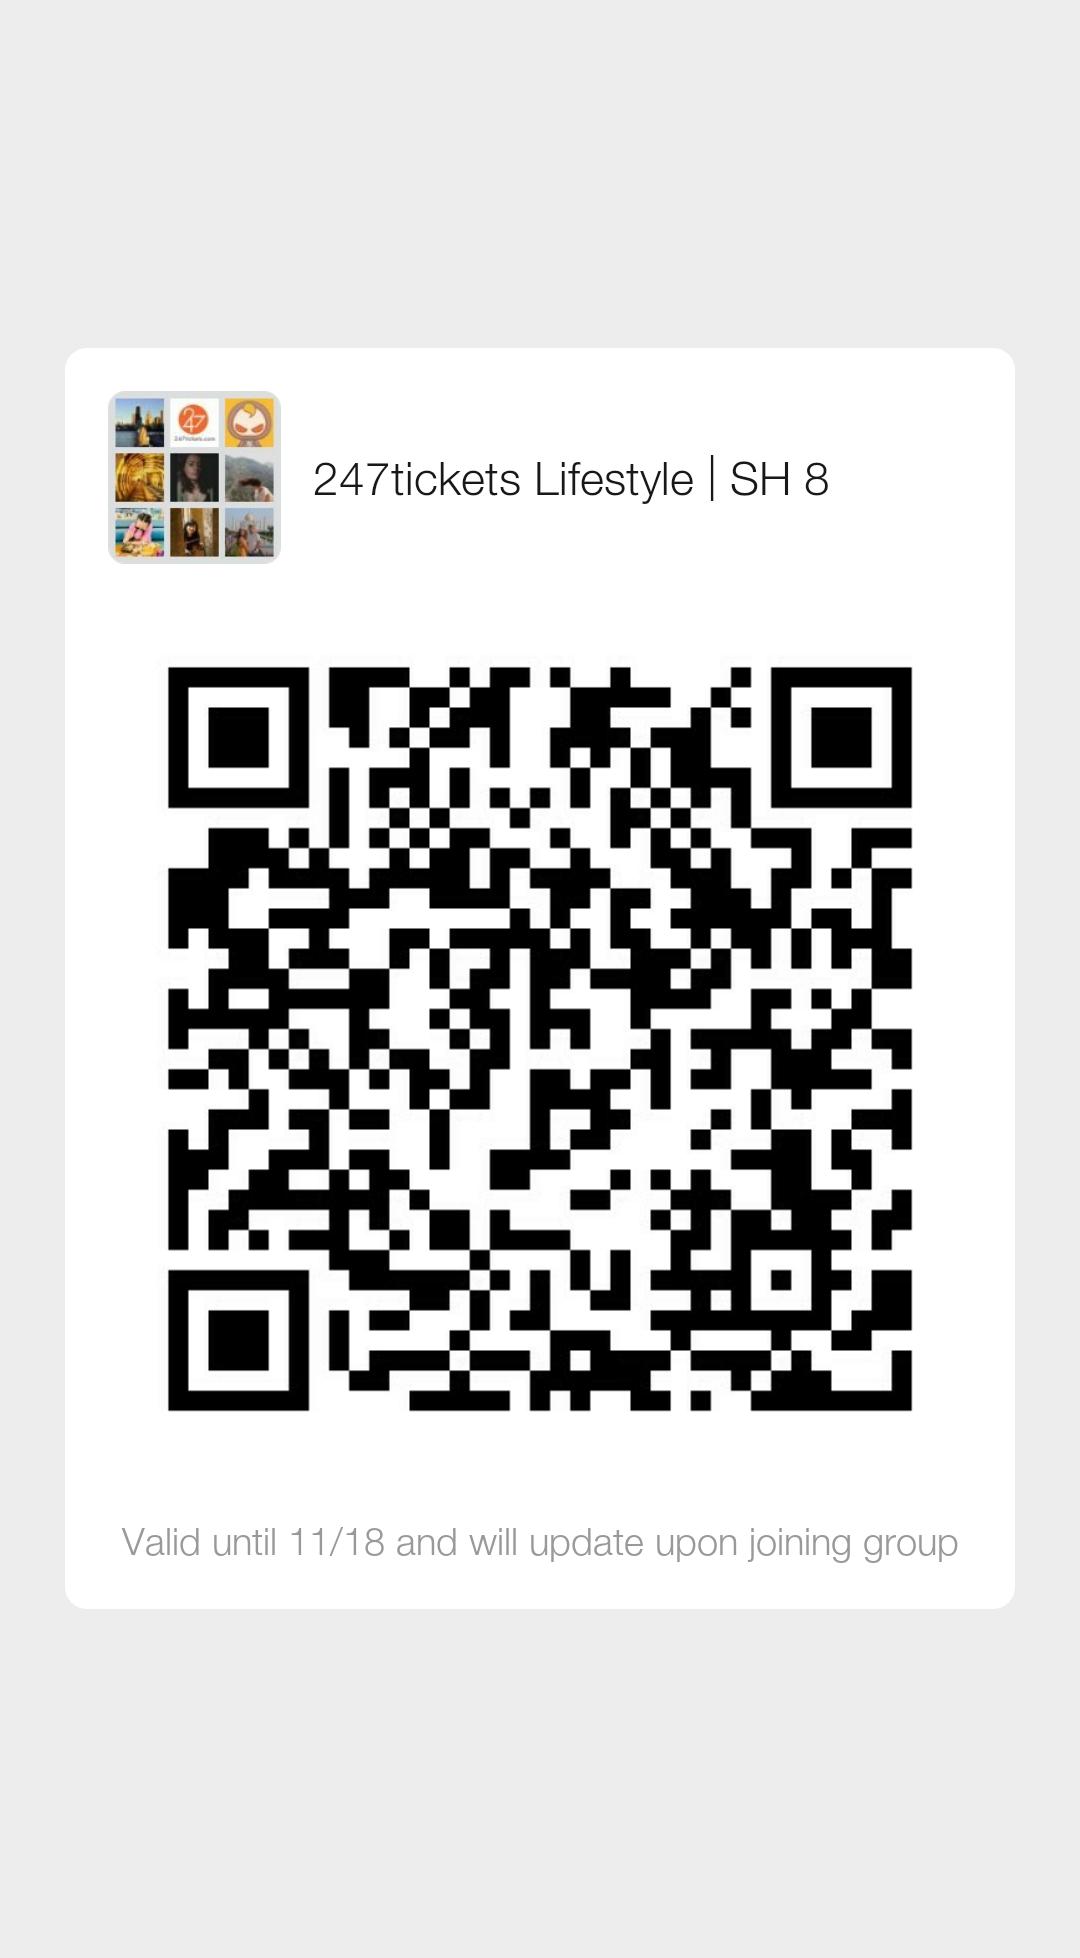 Shanghai gratis dating sites